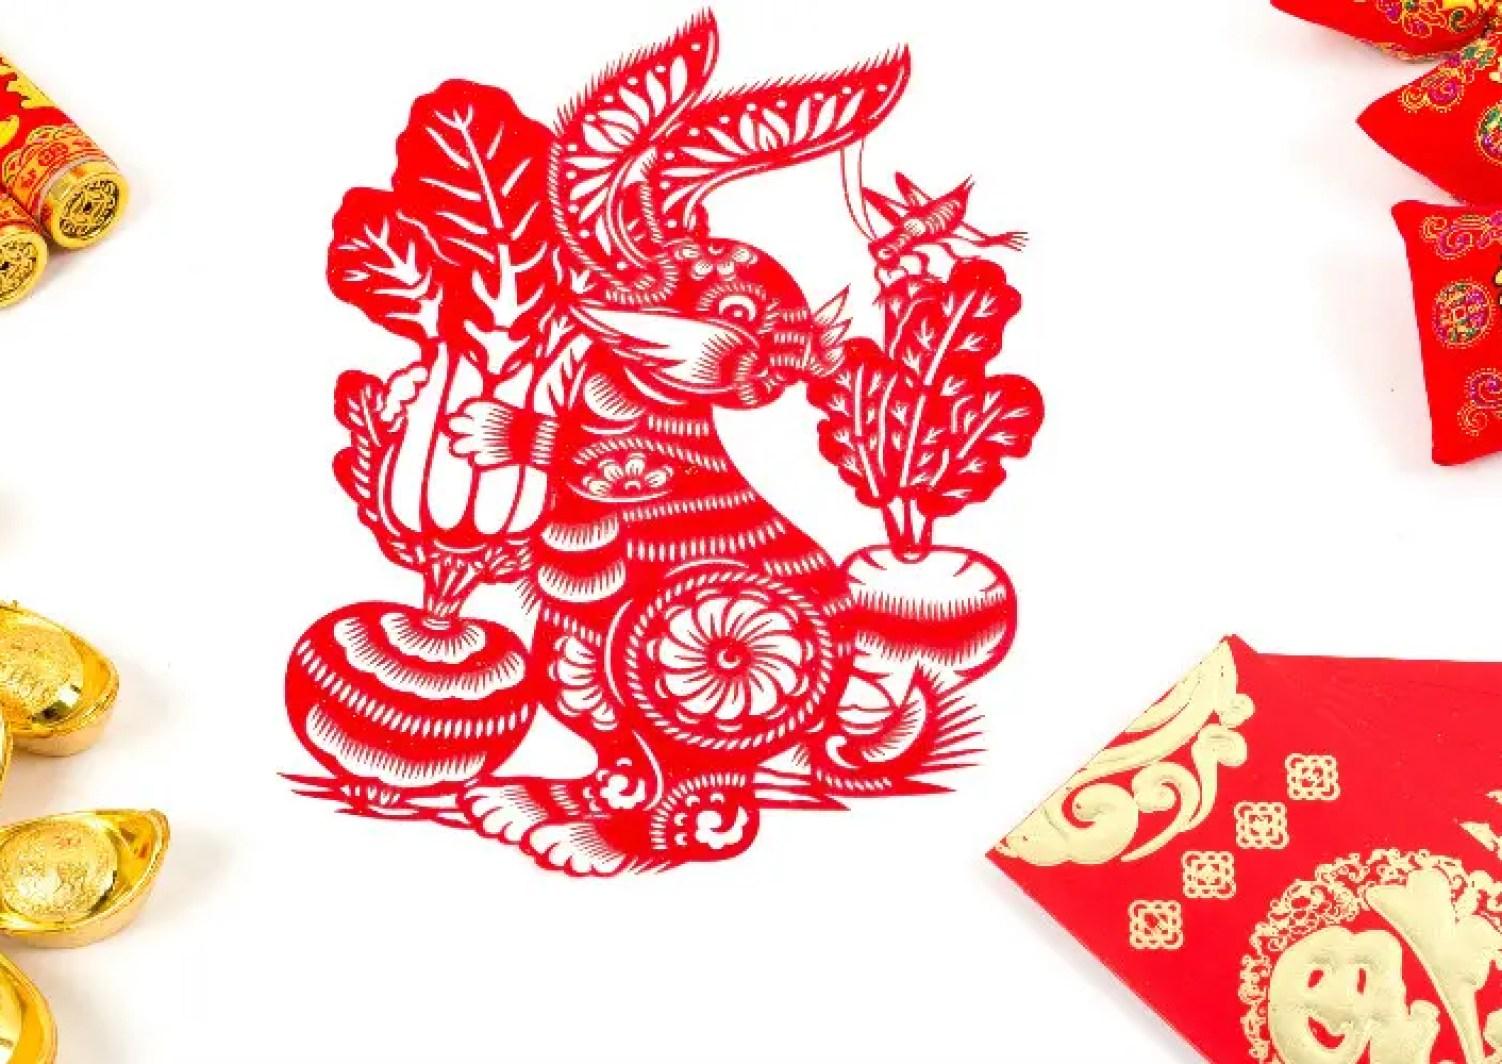 Chinese Zodiac Rabbit 2021 Horoscope Personality Year Of The Rabbit Include 2023 2011 1999 1987 1975 1963